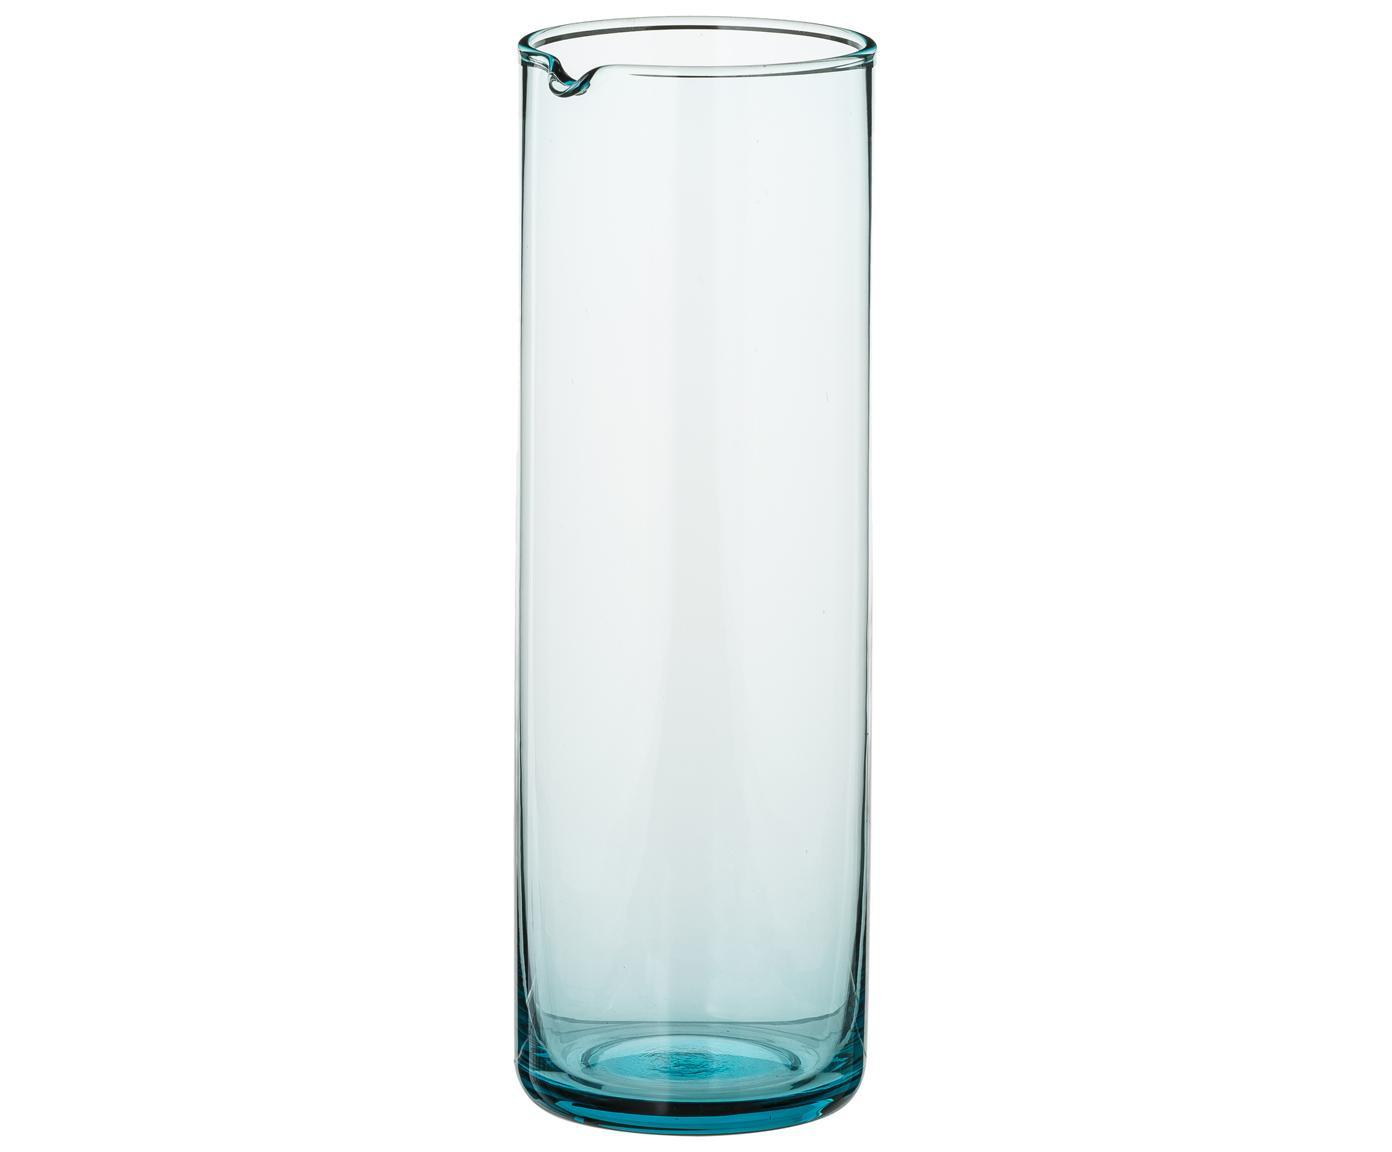 Karaf Bloom, Glas, Turquoise, 1 L